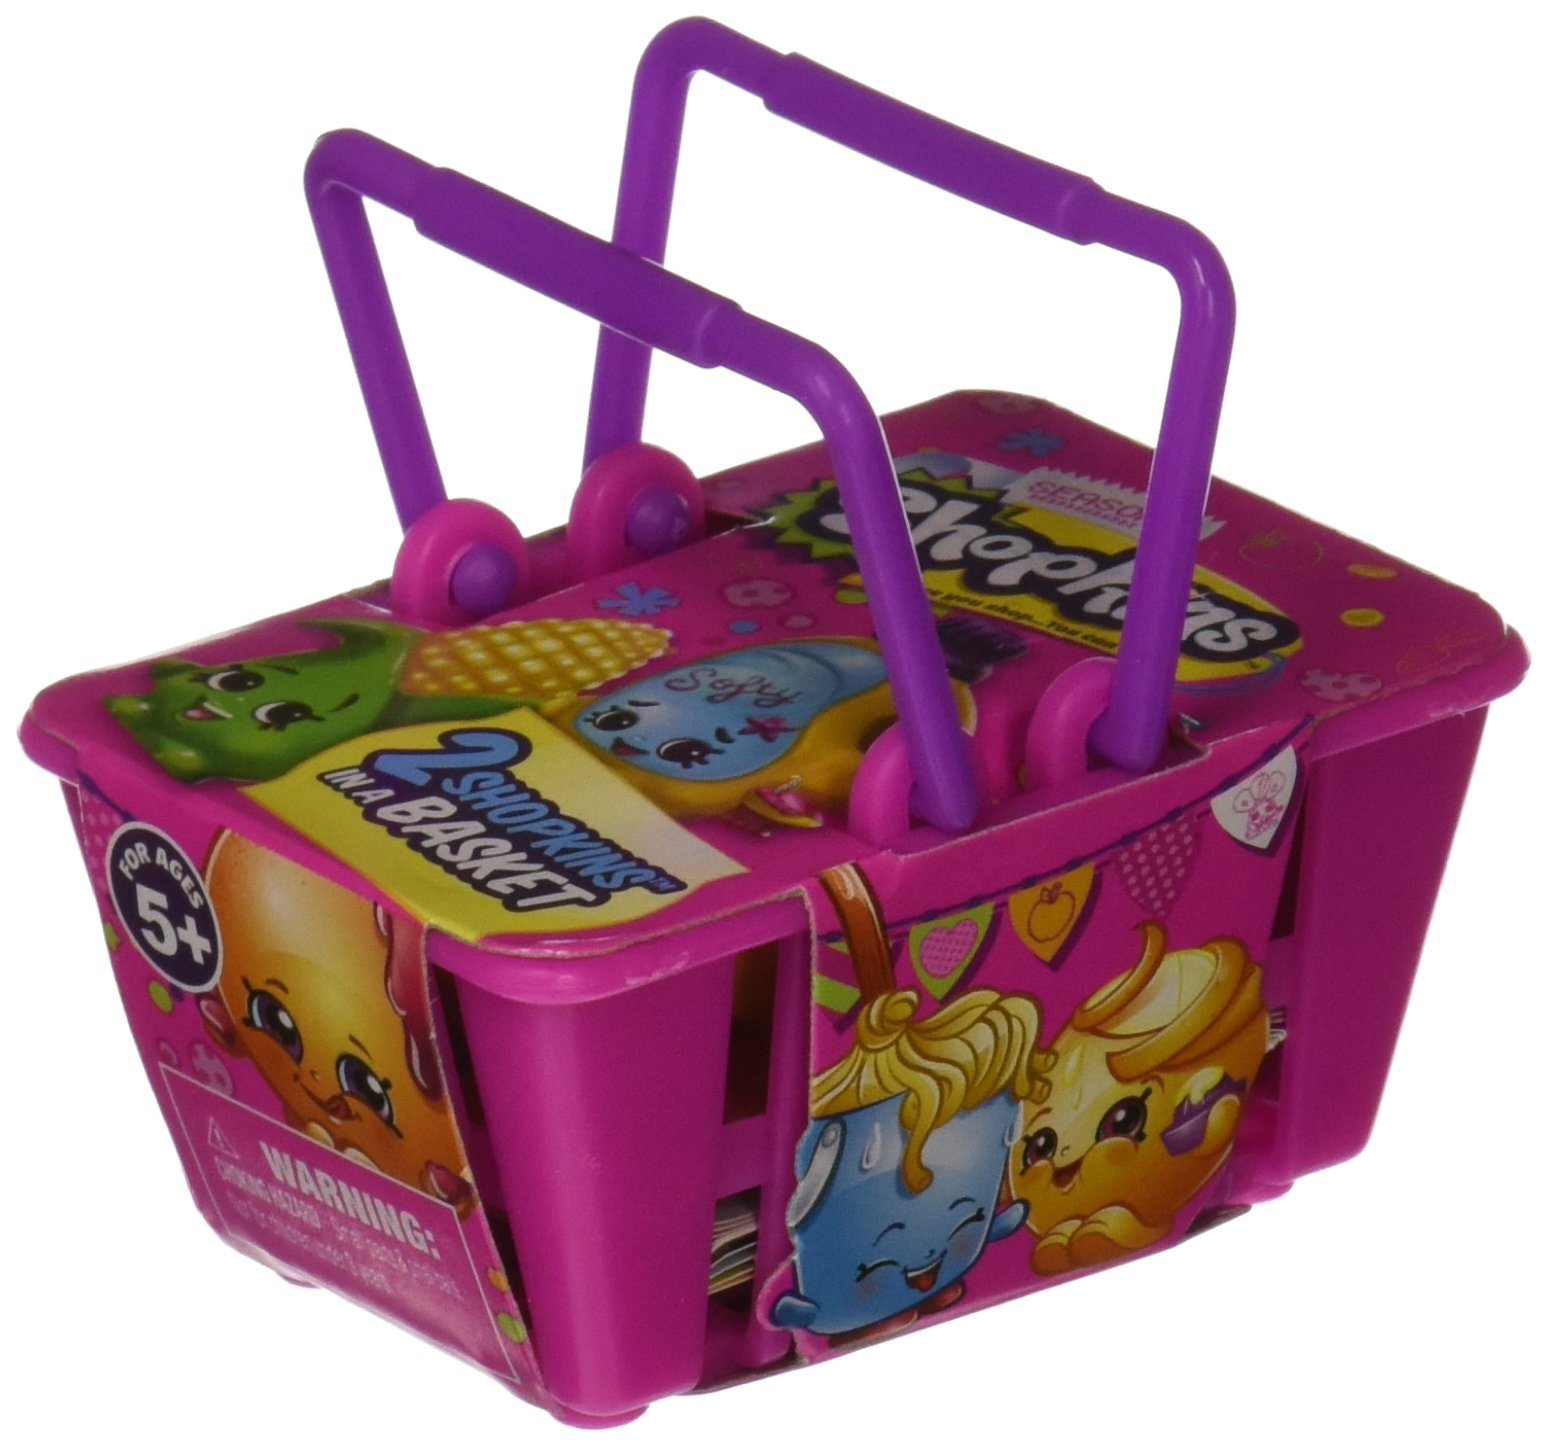 Shopkins Shopping Basket Season 2 Case of 30